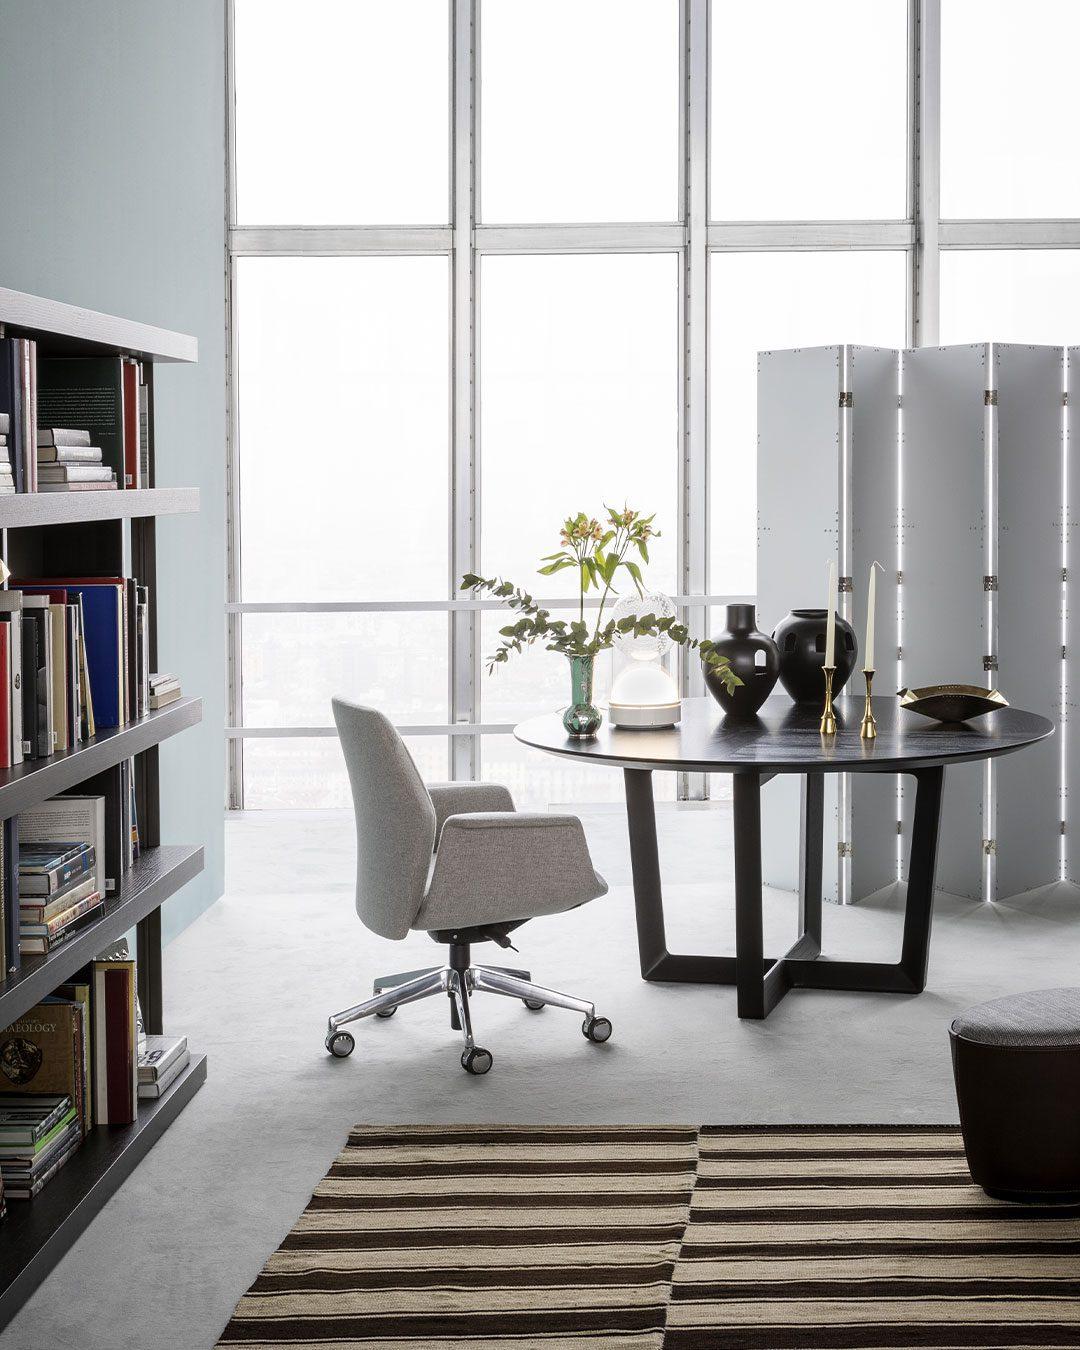 oficina con planta